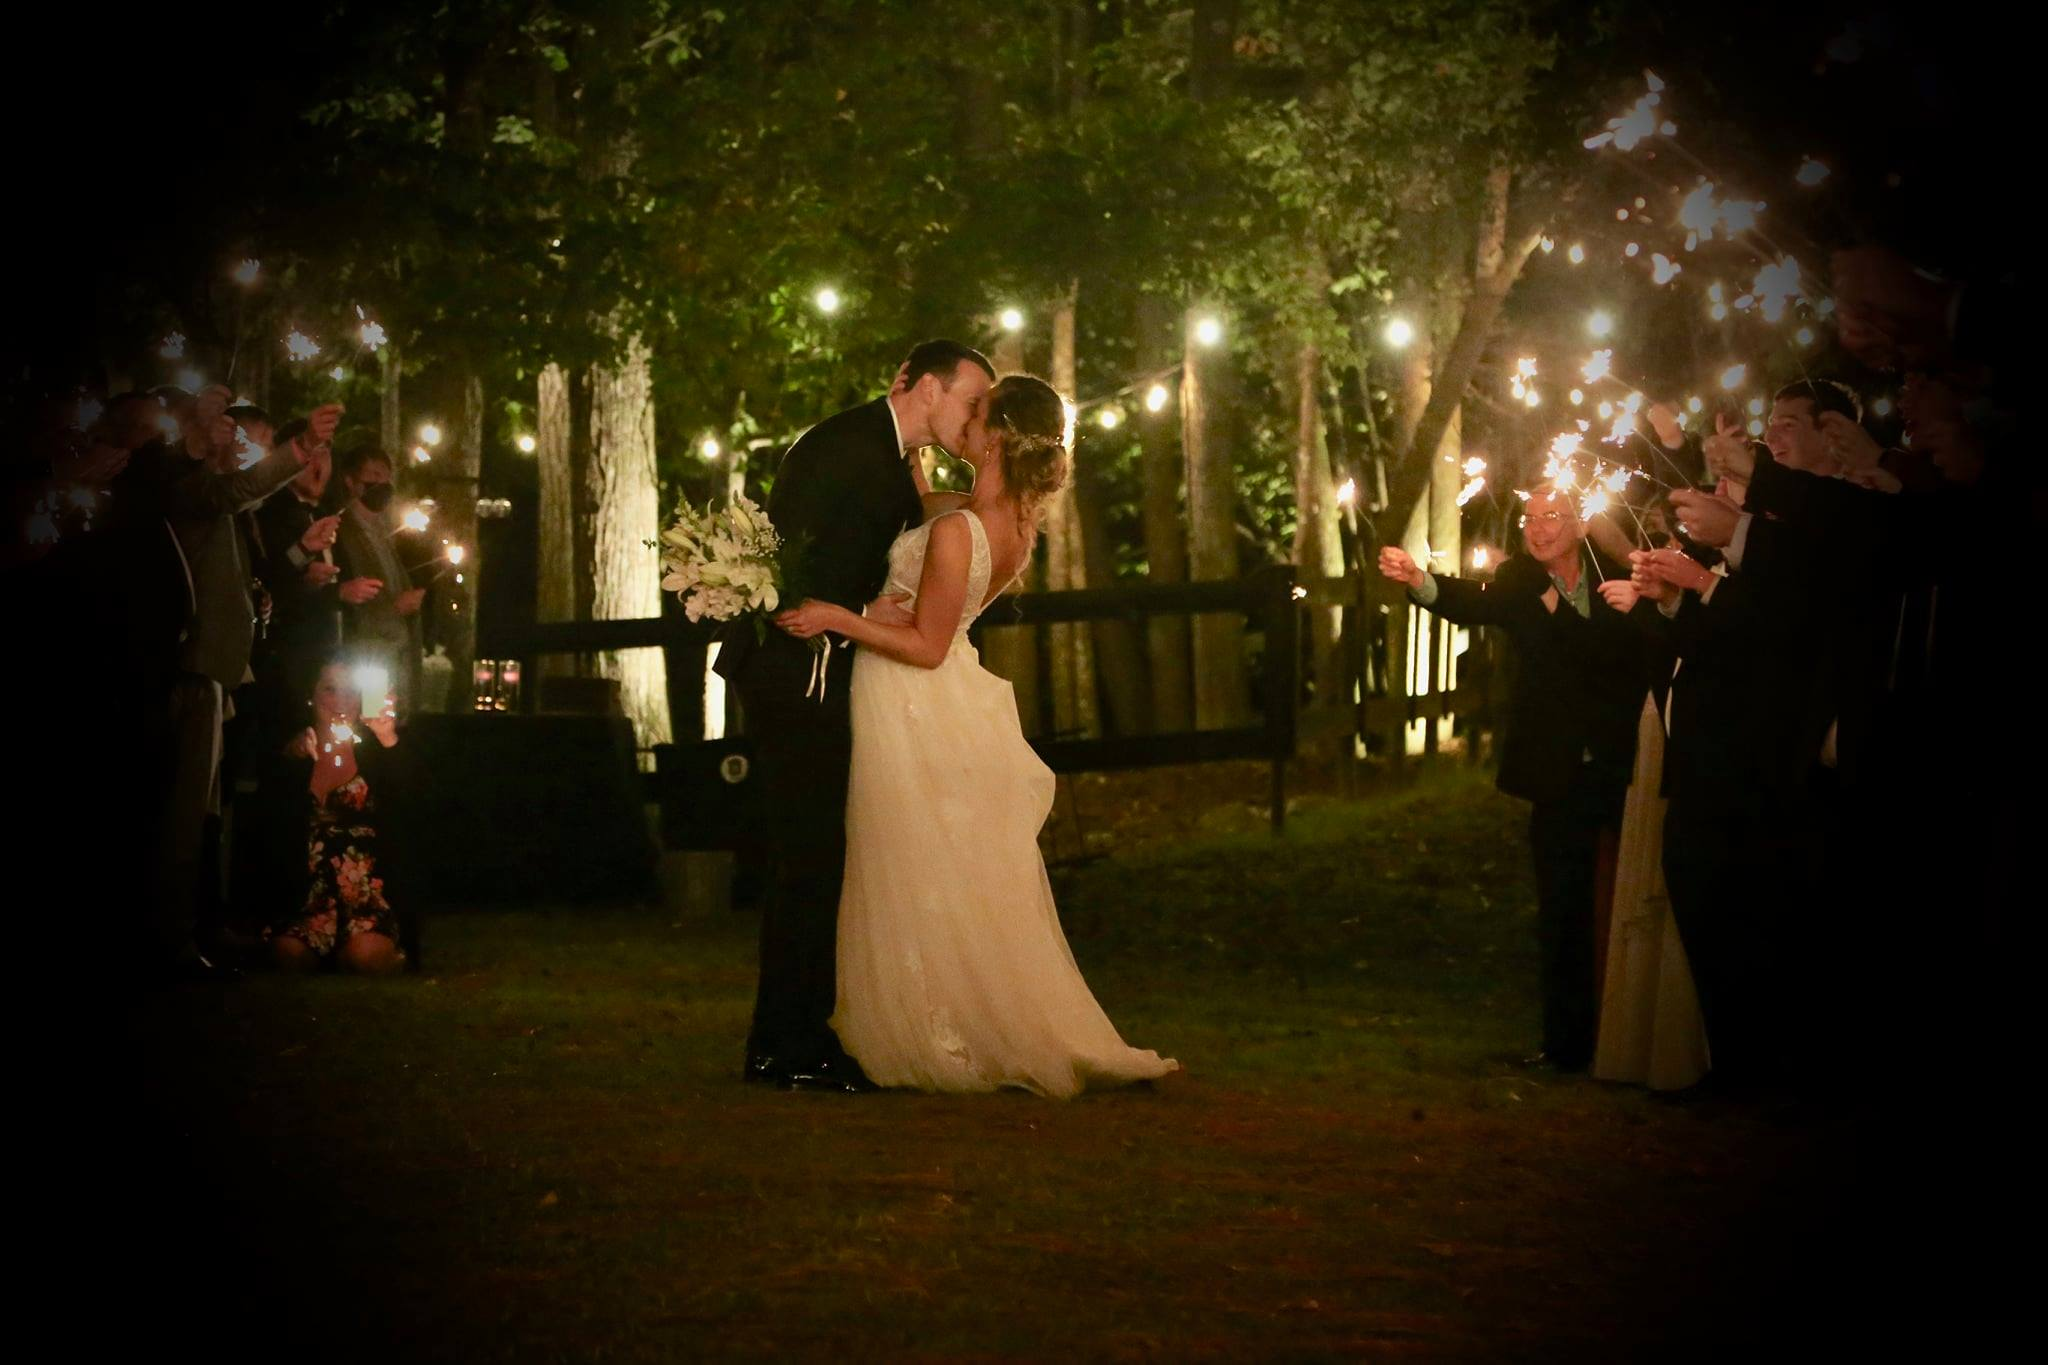 sparkler exit at farm wedding venue in raleigh north carolina